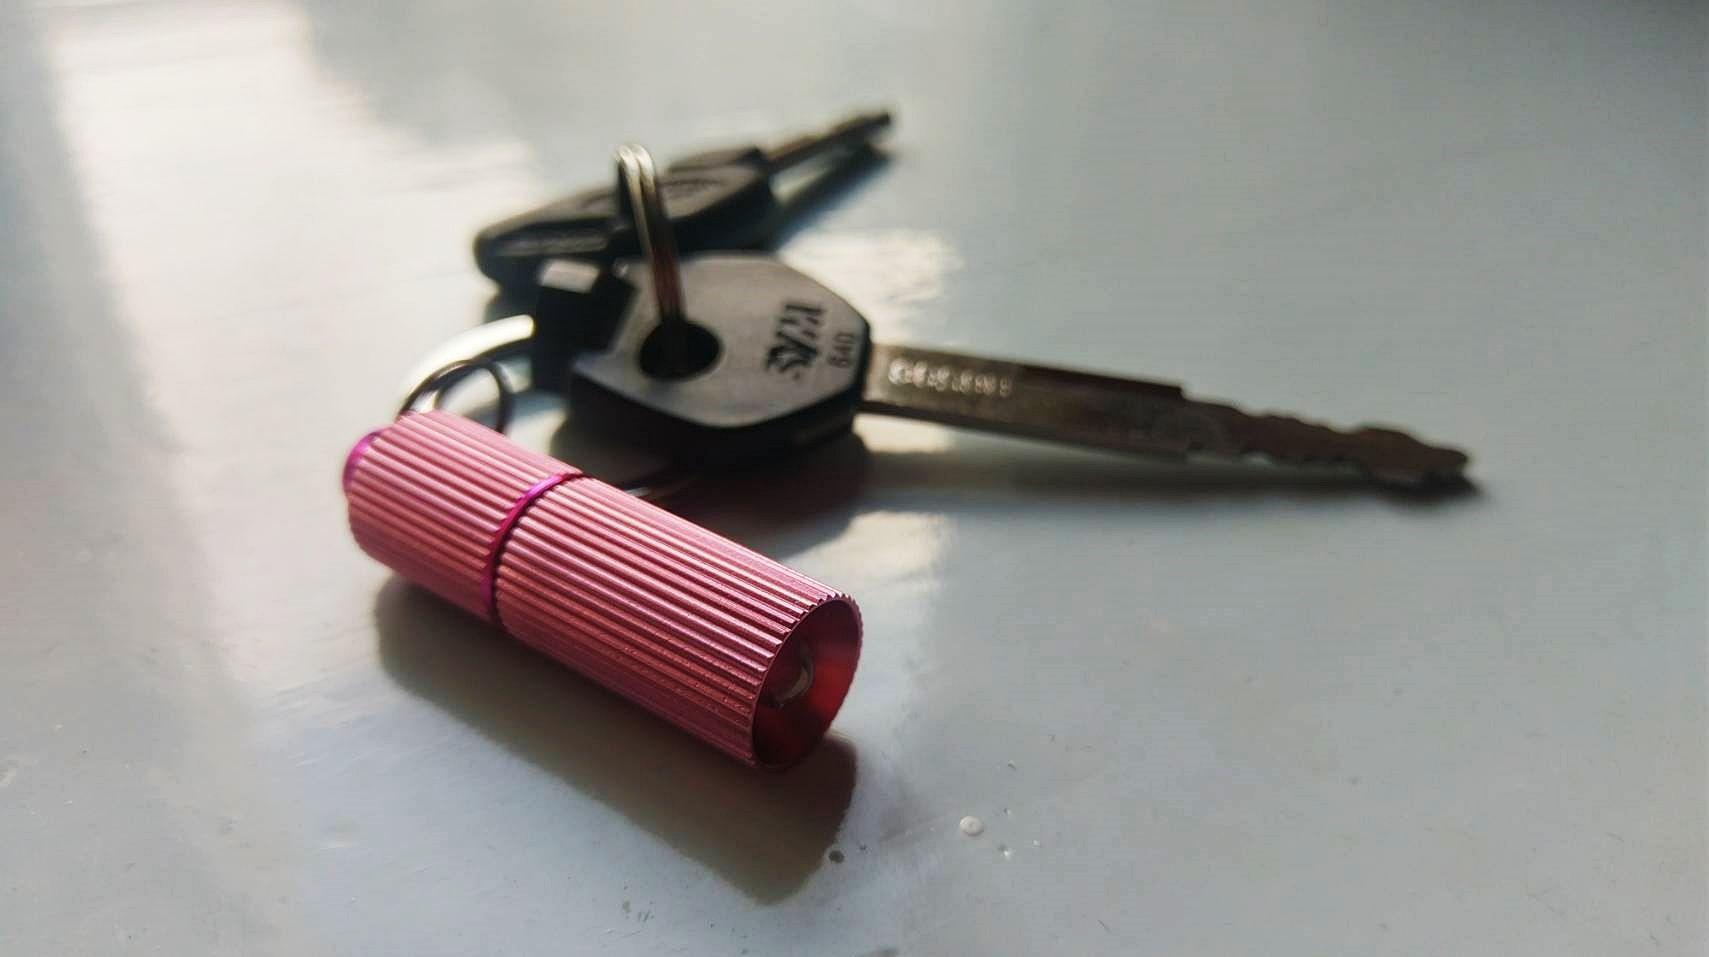 PISA Light Rechargeable Keychain Flashlight